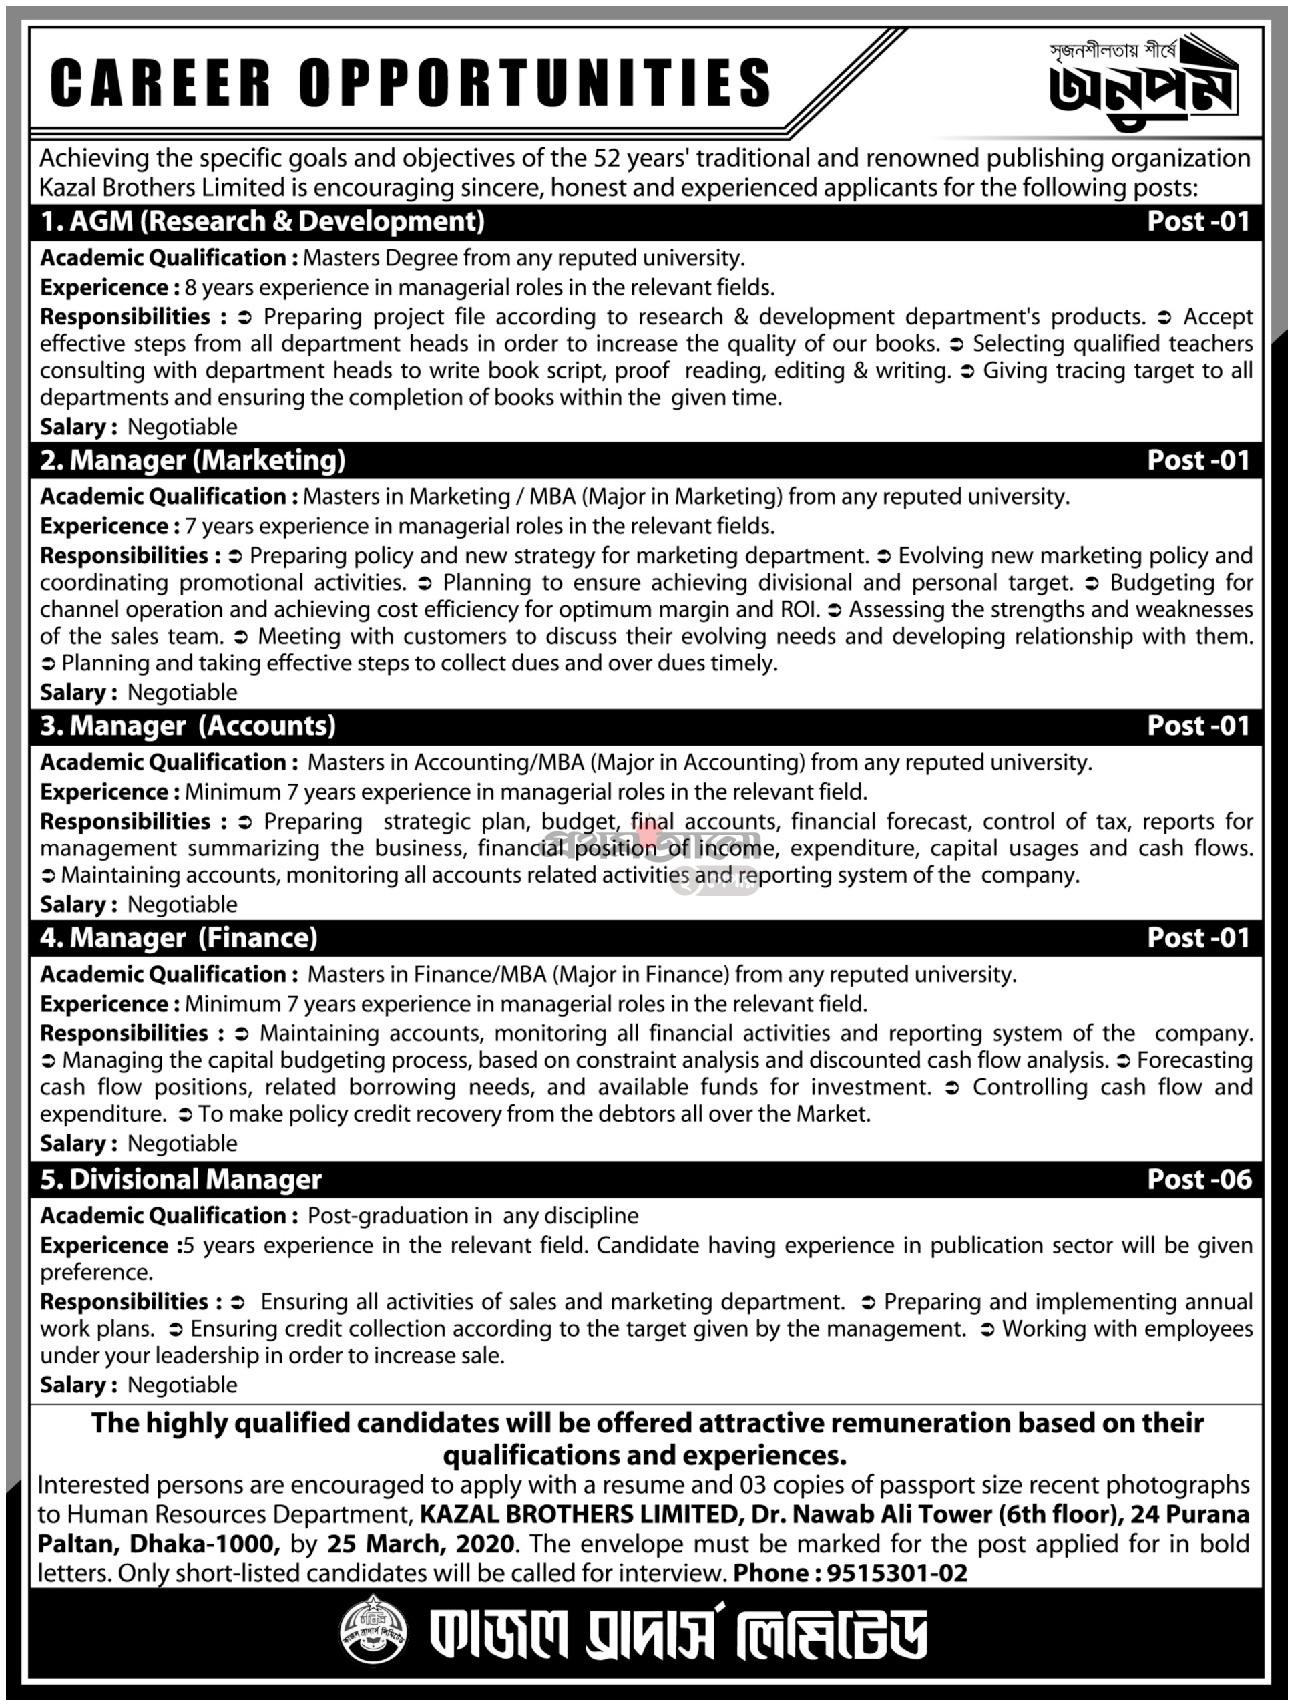 Kazal Brothers Limited Job Circular 2020